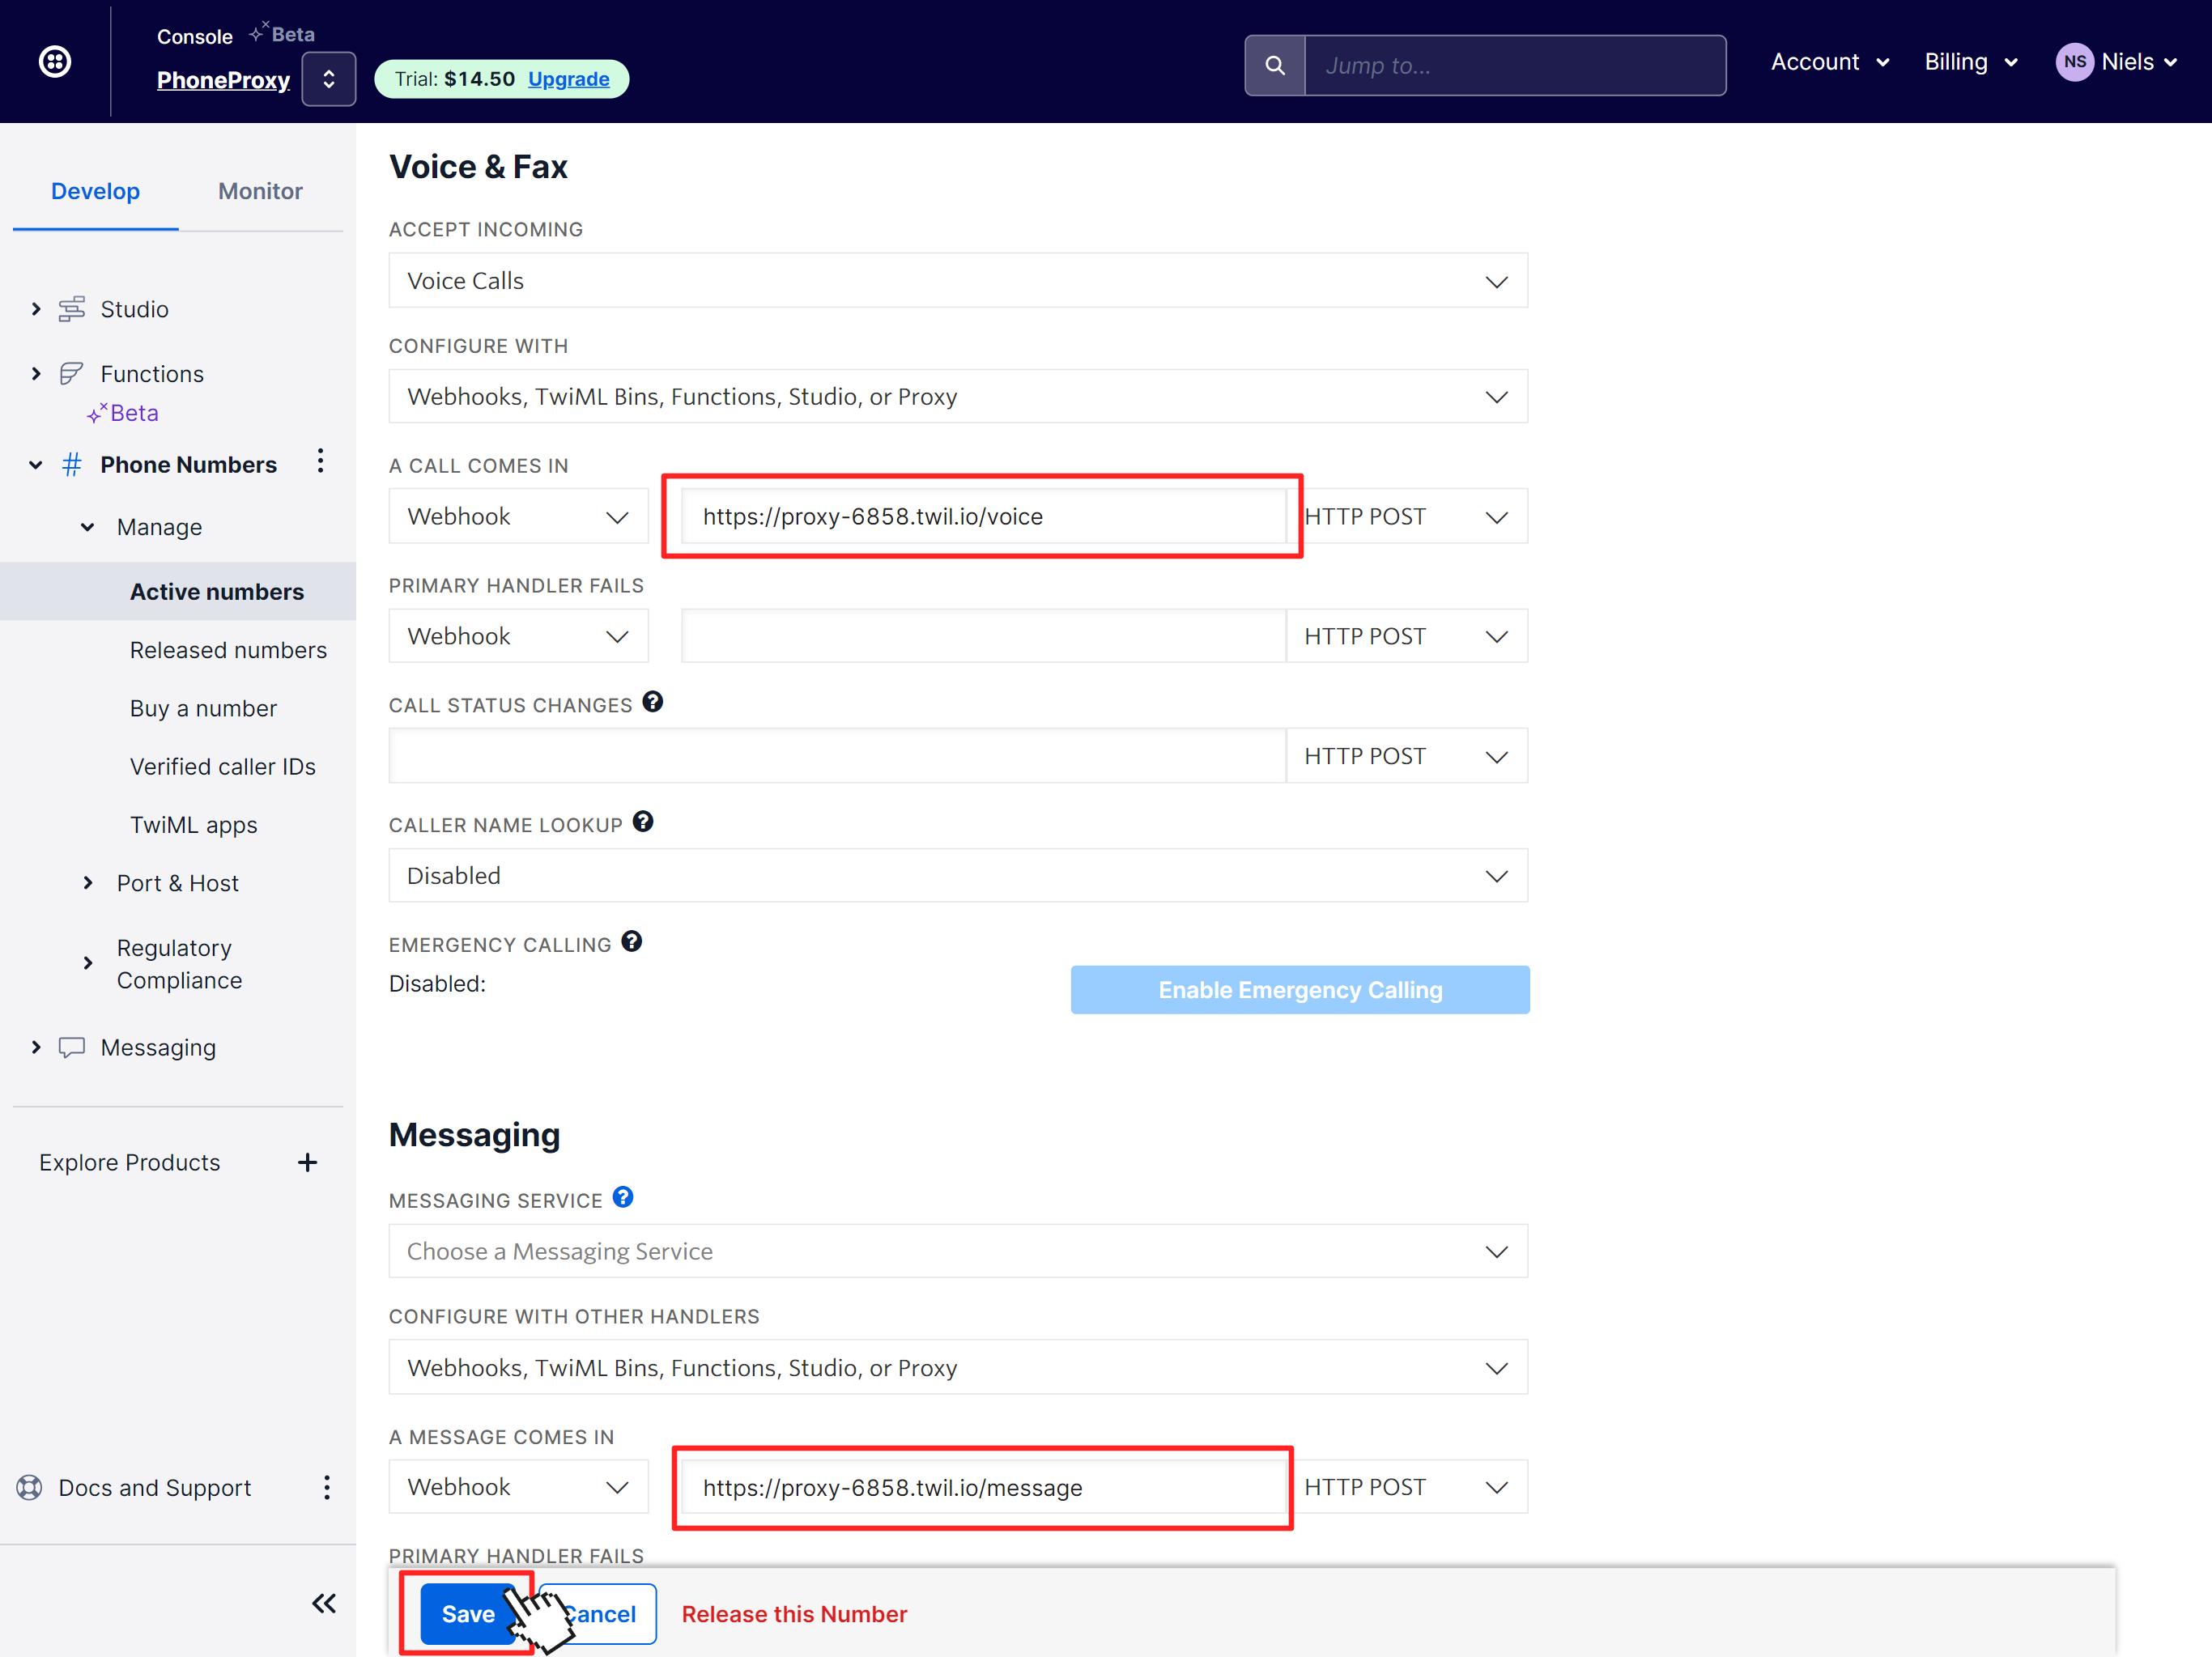 Twilio phone number settings with webhook URLs configured